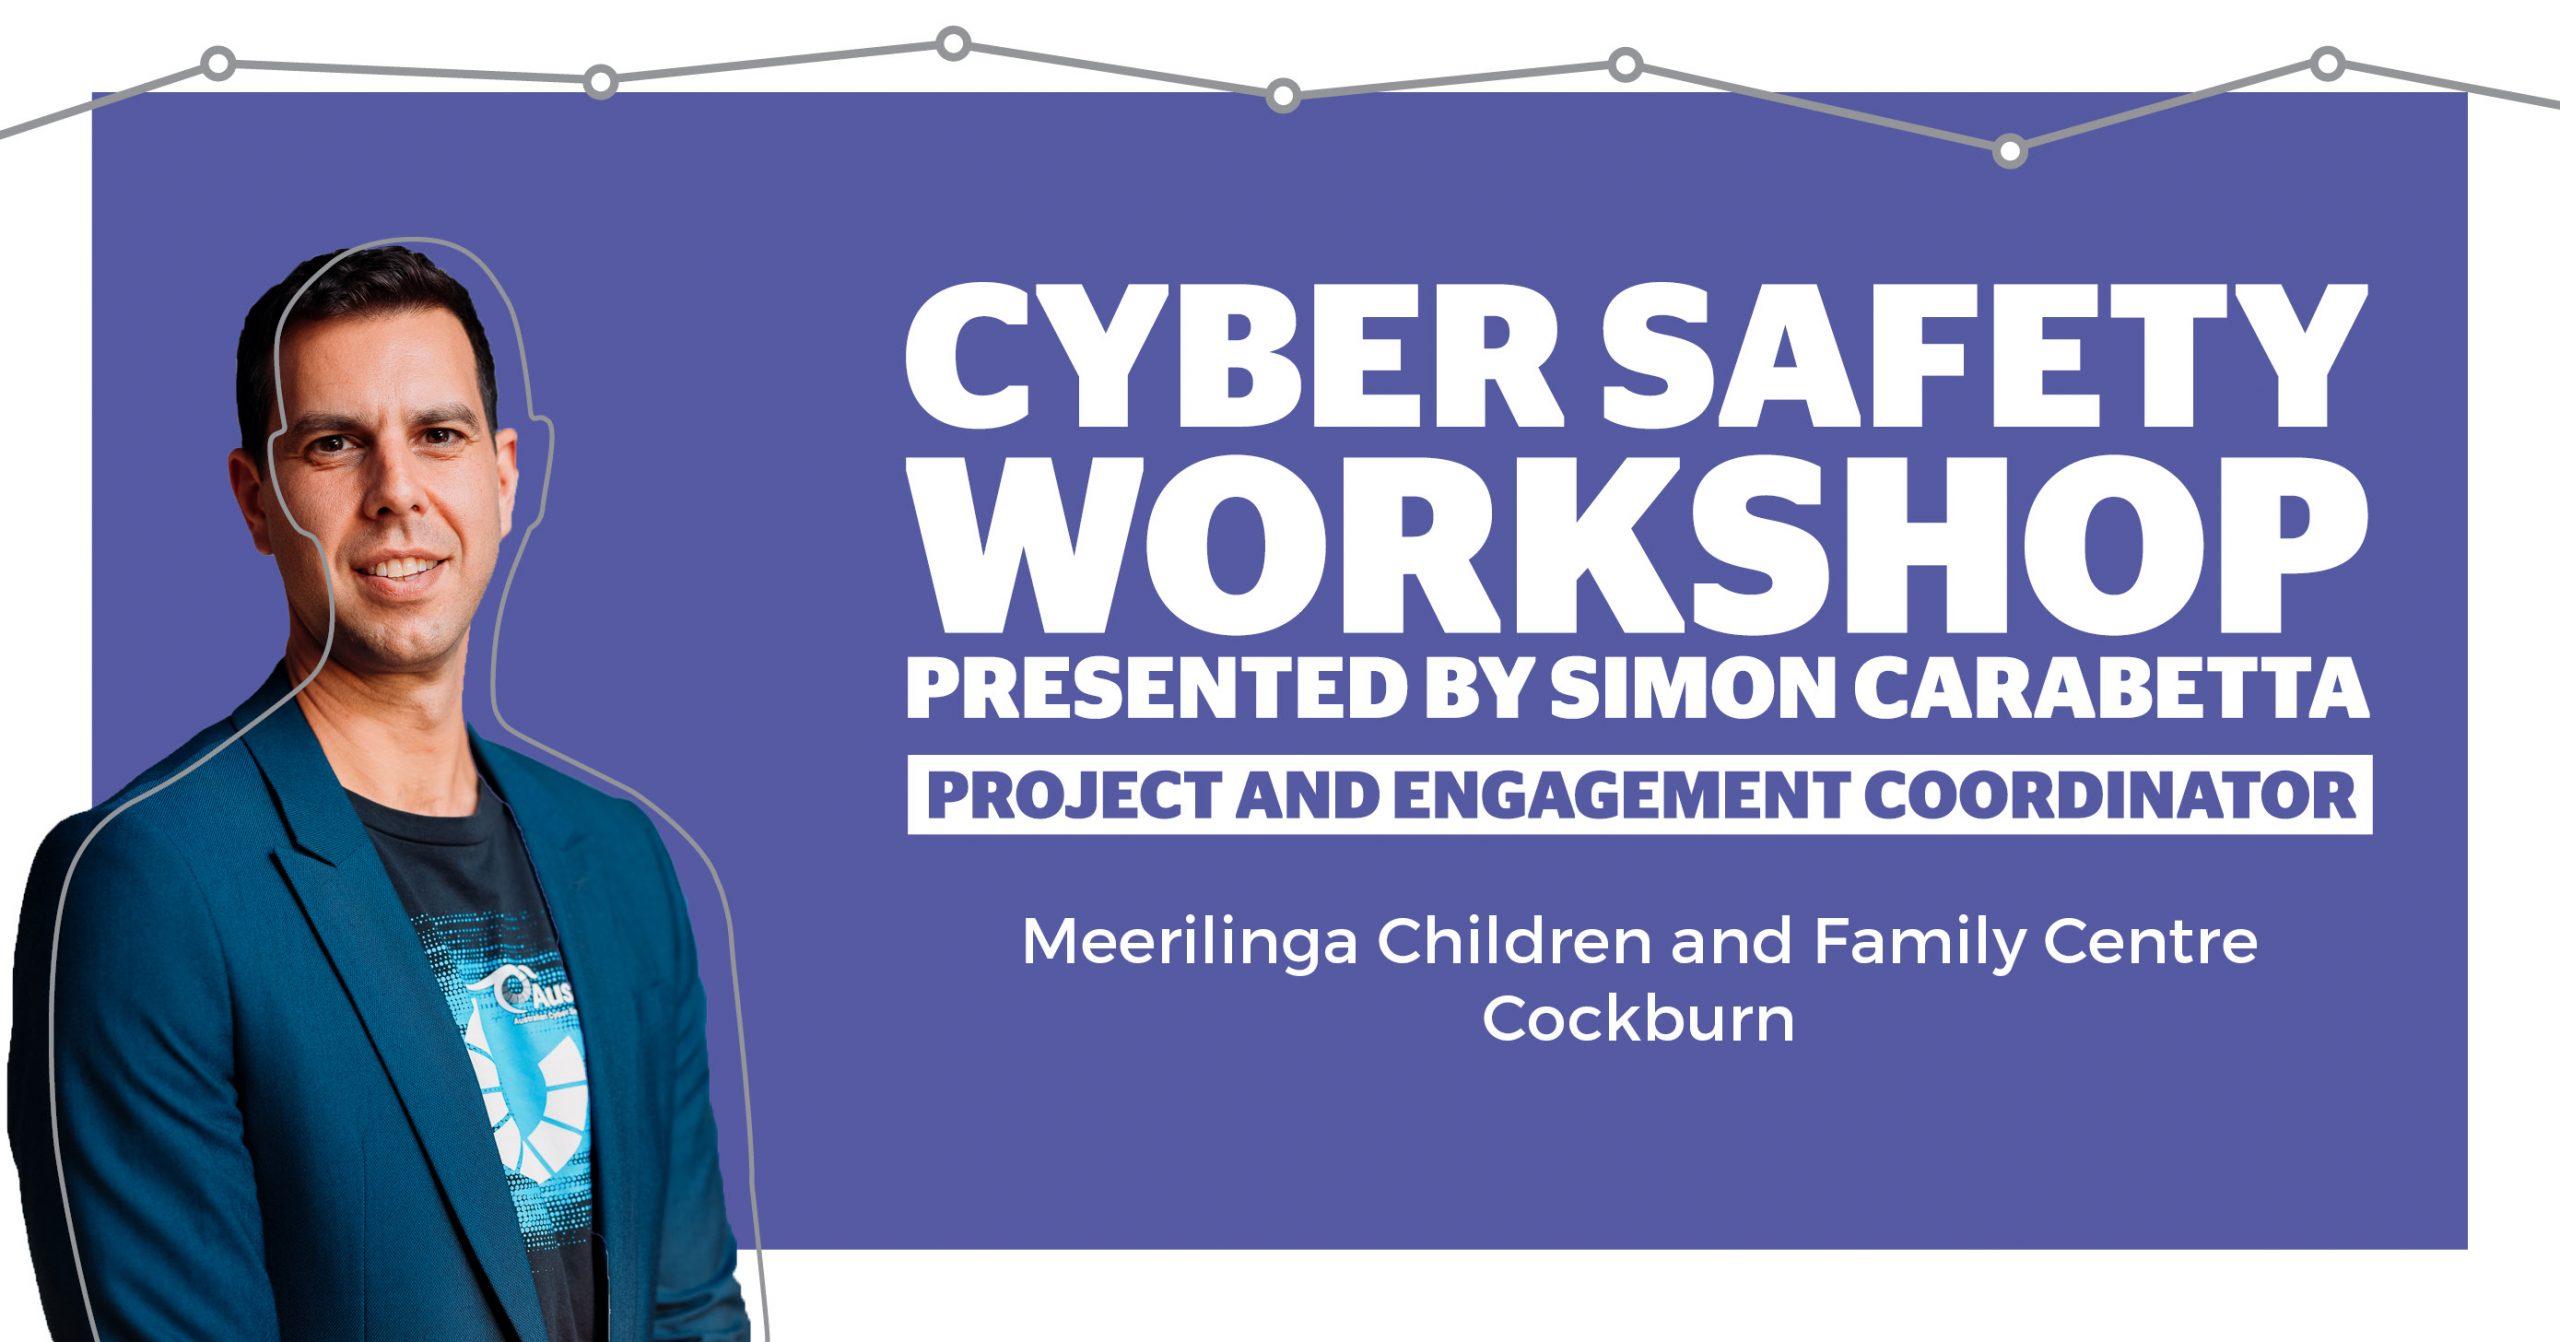 Cyber Safety Workshop